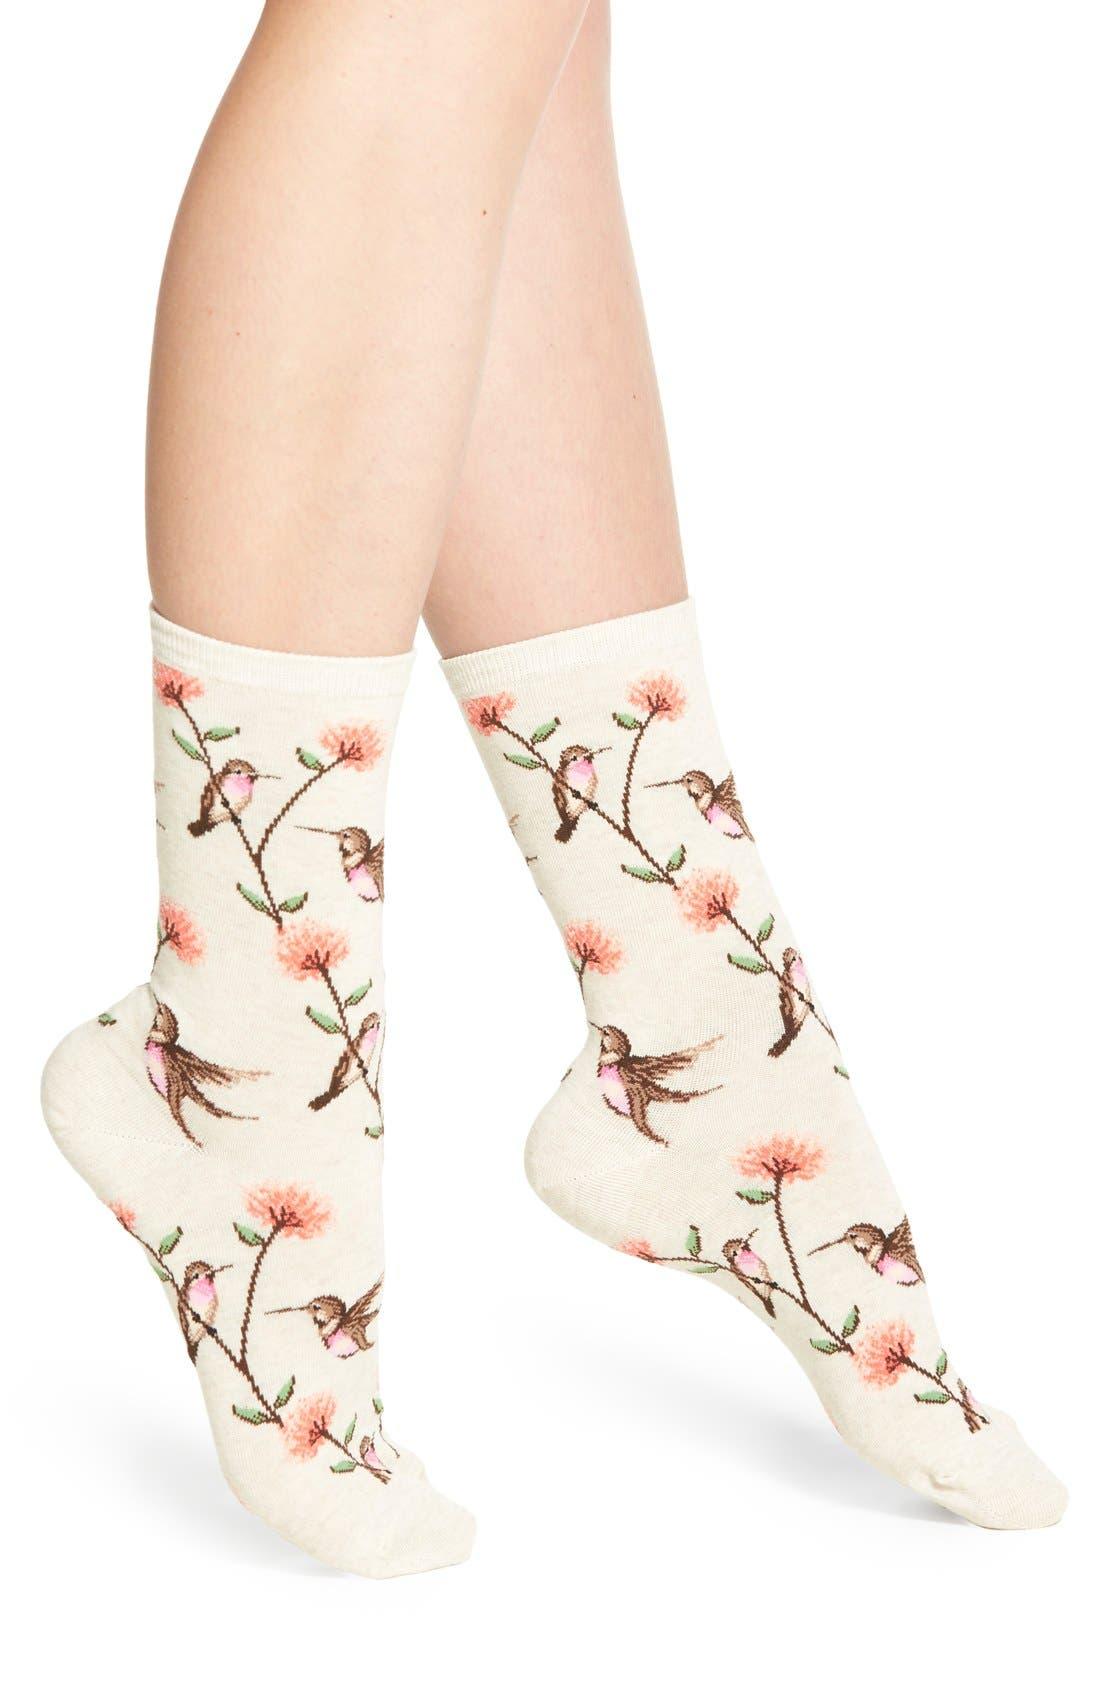 Alternate Image 1 Selected - Hot Sox 'Hummingbirds' Socks (3 for $15)